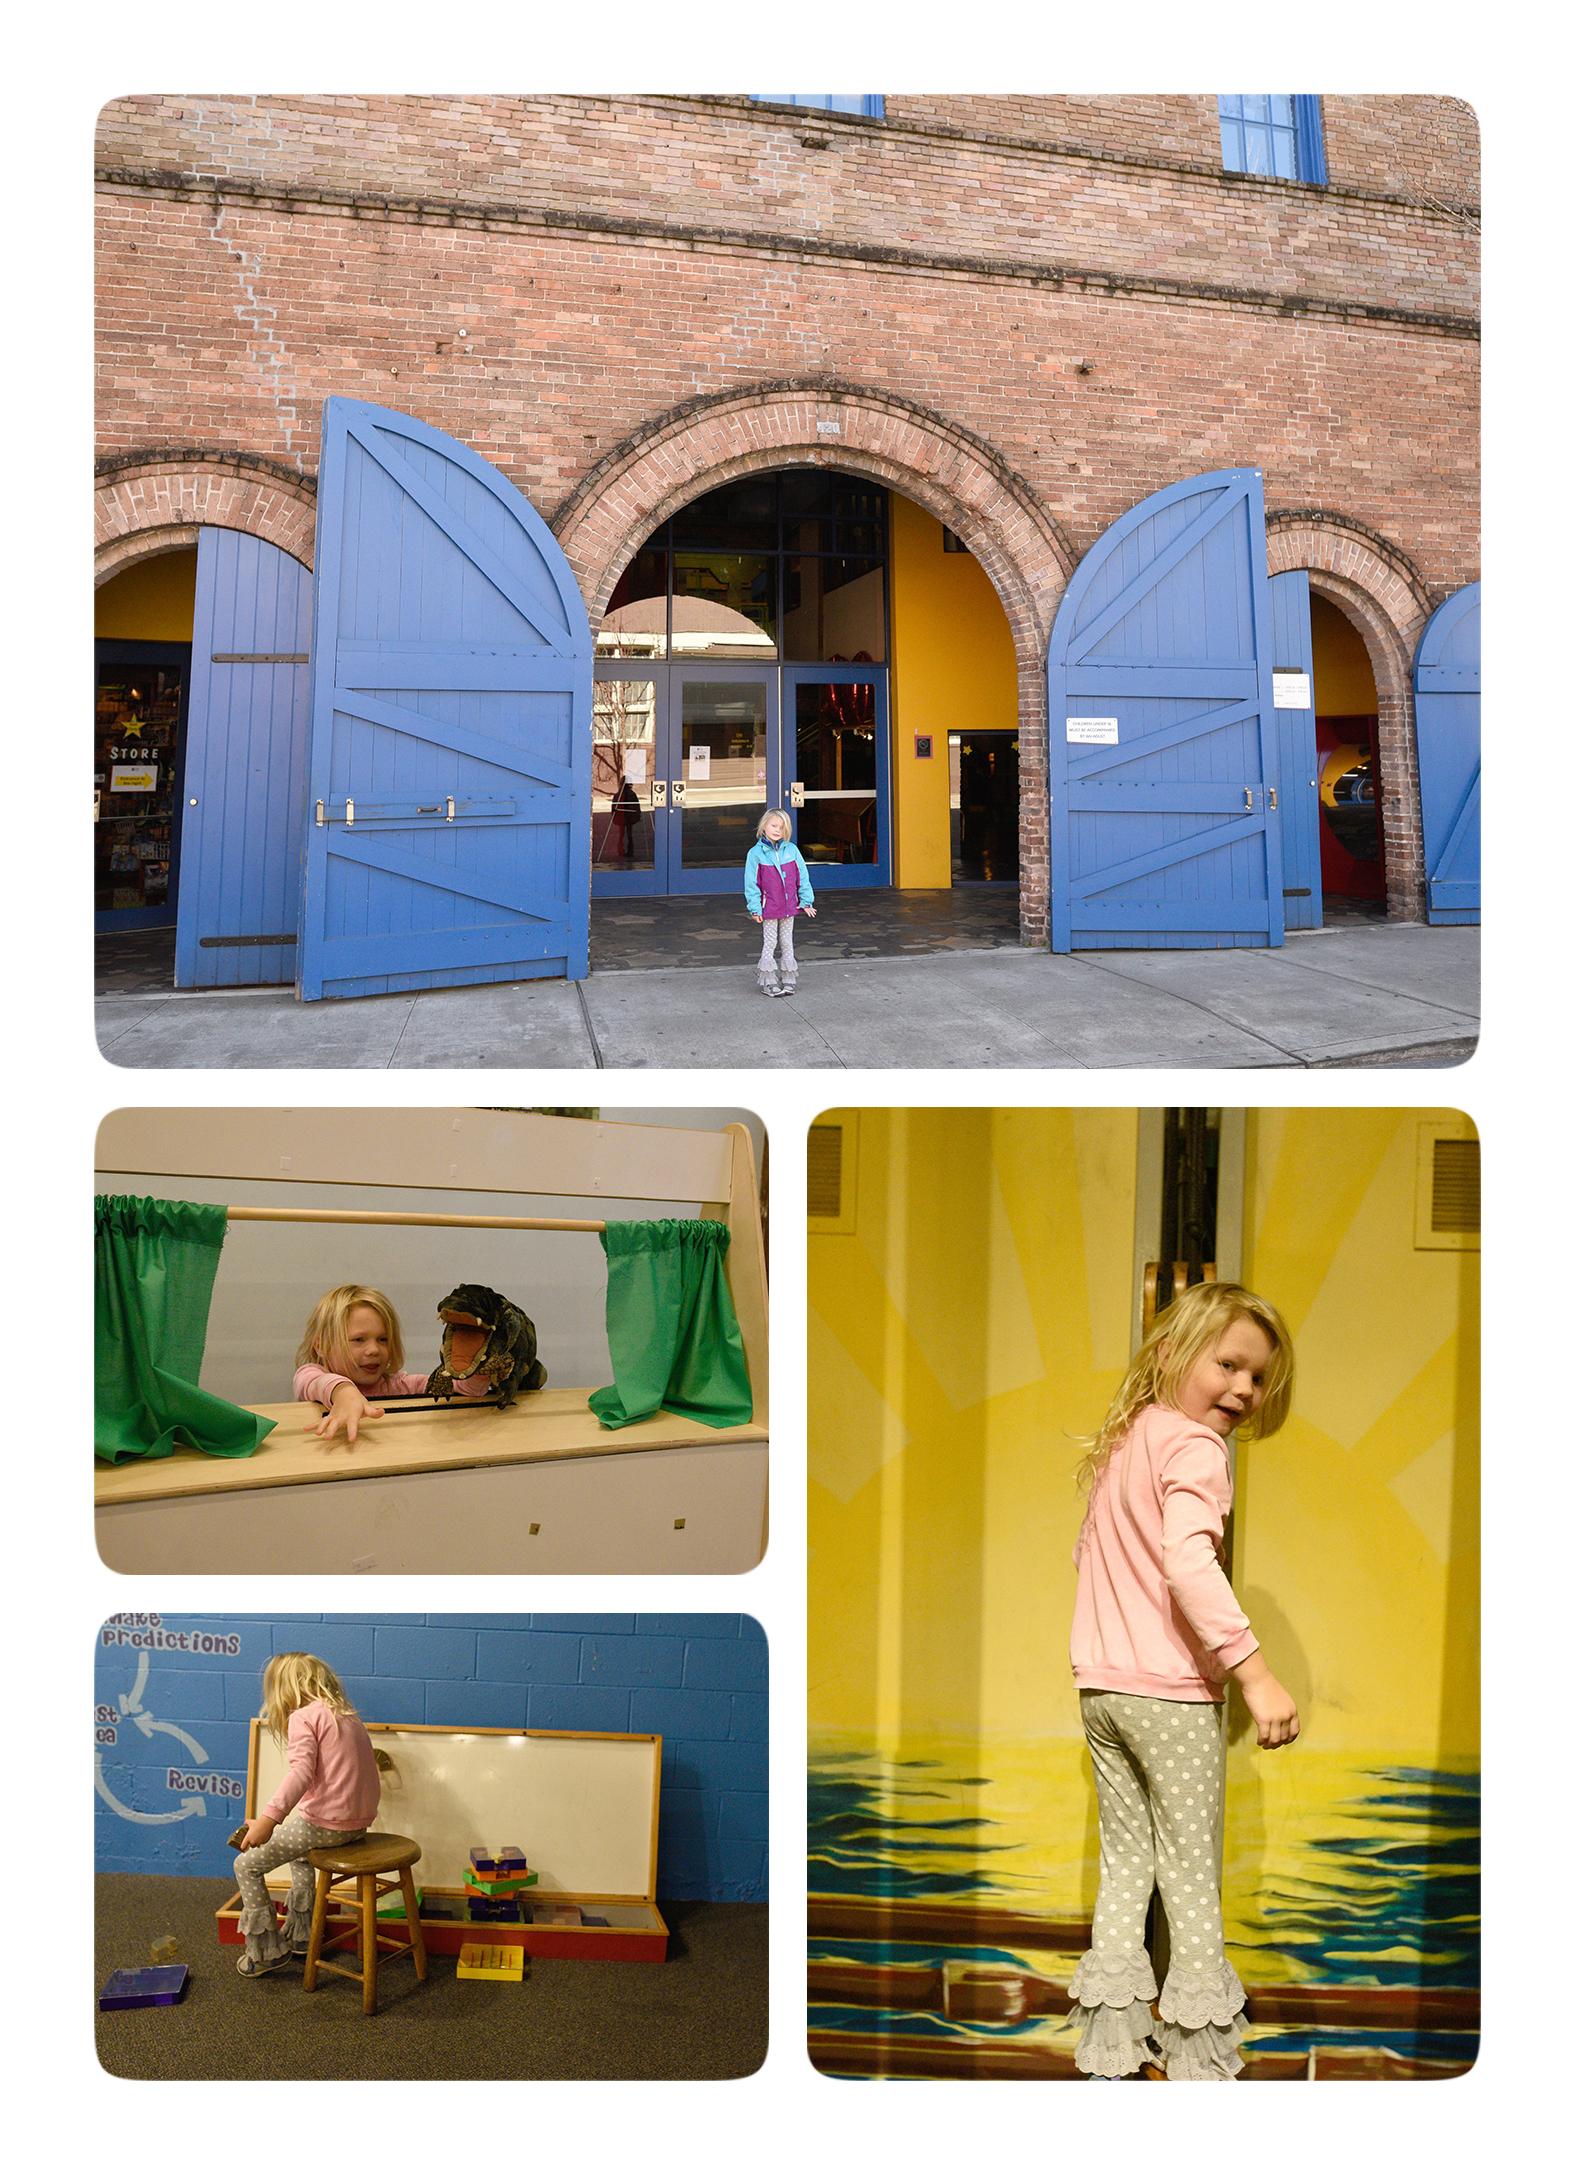 ChildrensMuseum1